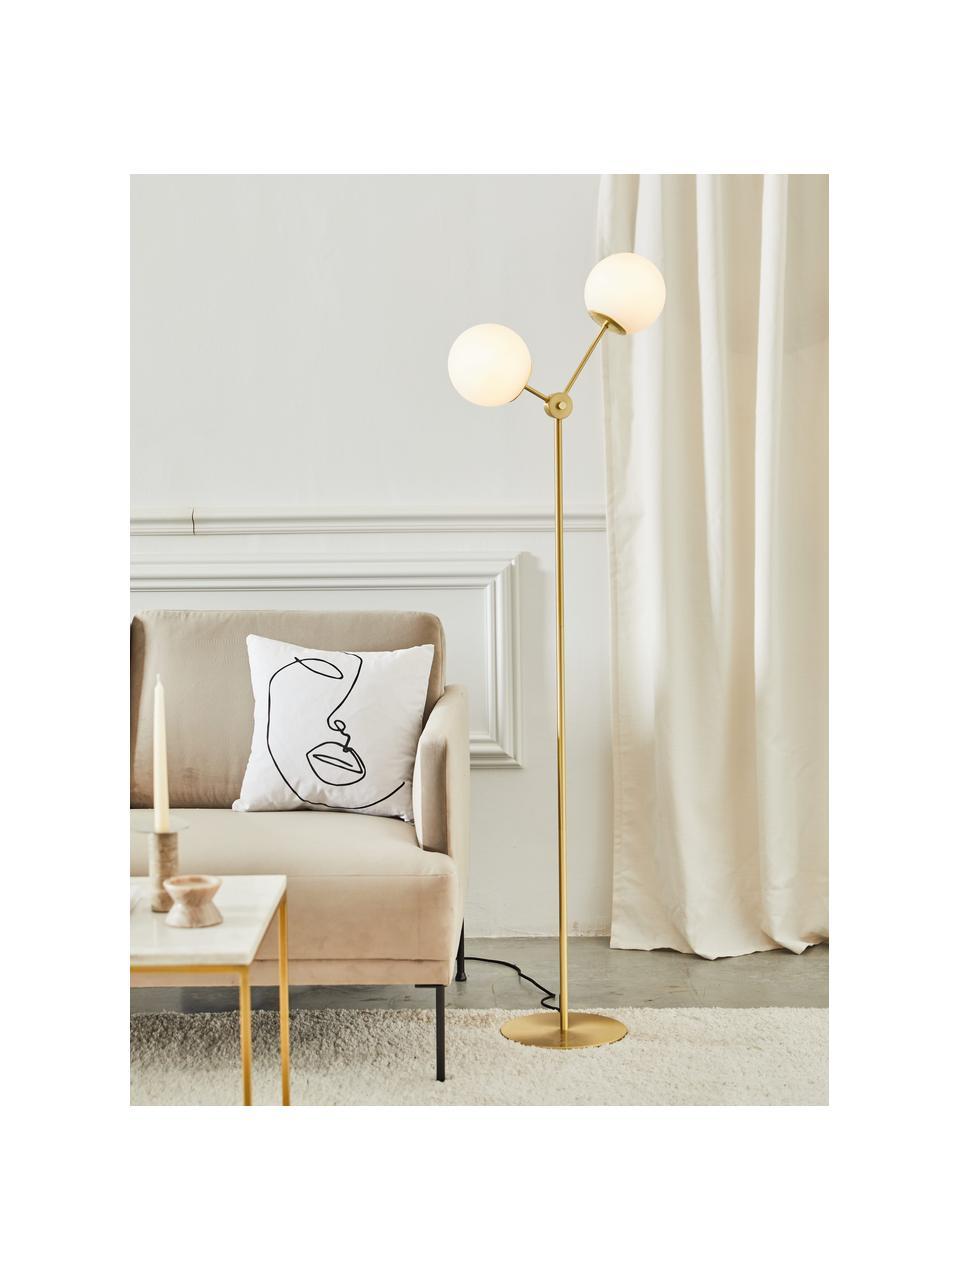 Stehlampe Aurelia aus Opalglas, Lampenfuß: Metall, vermessingt, Messing, Weiß, Ø 25 x H 155 cm